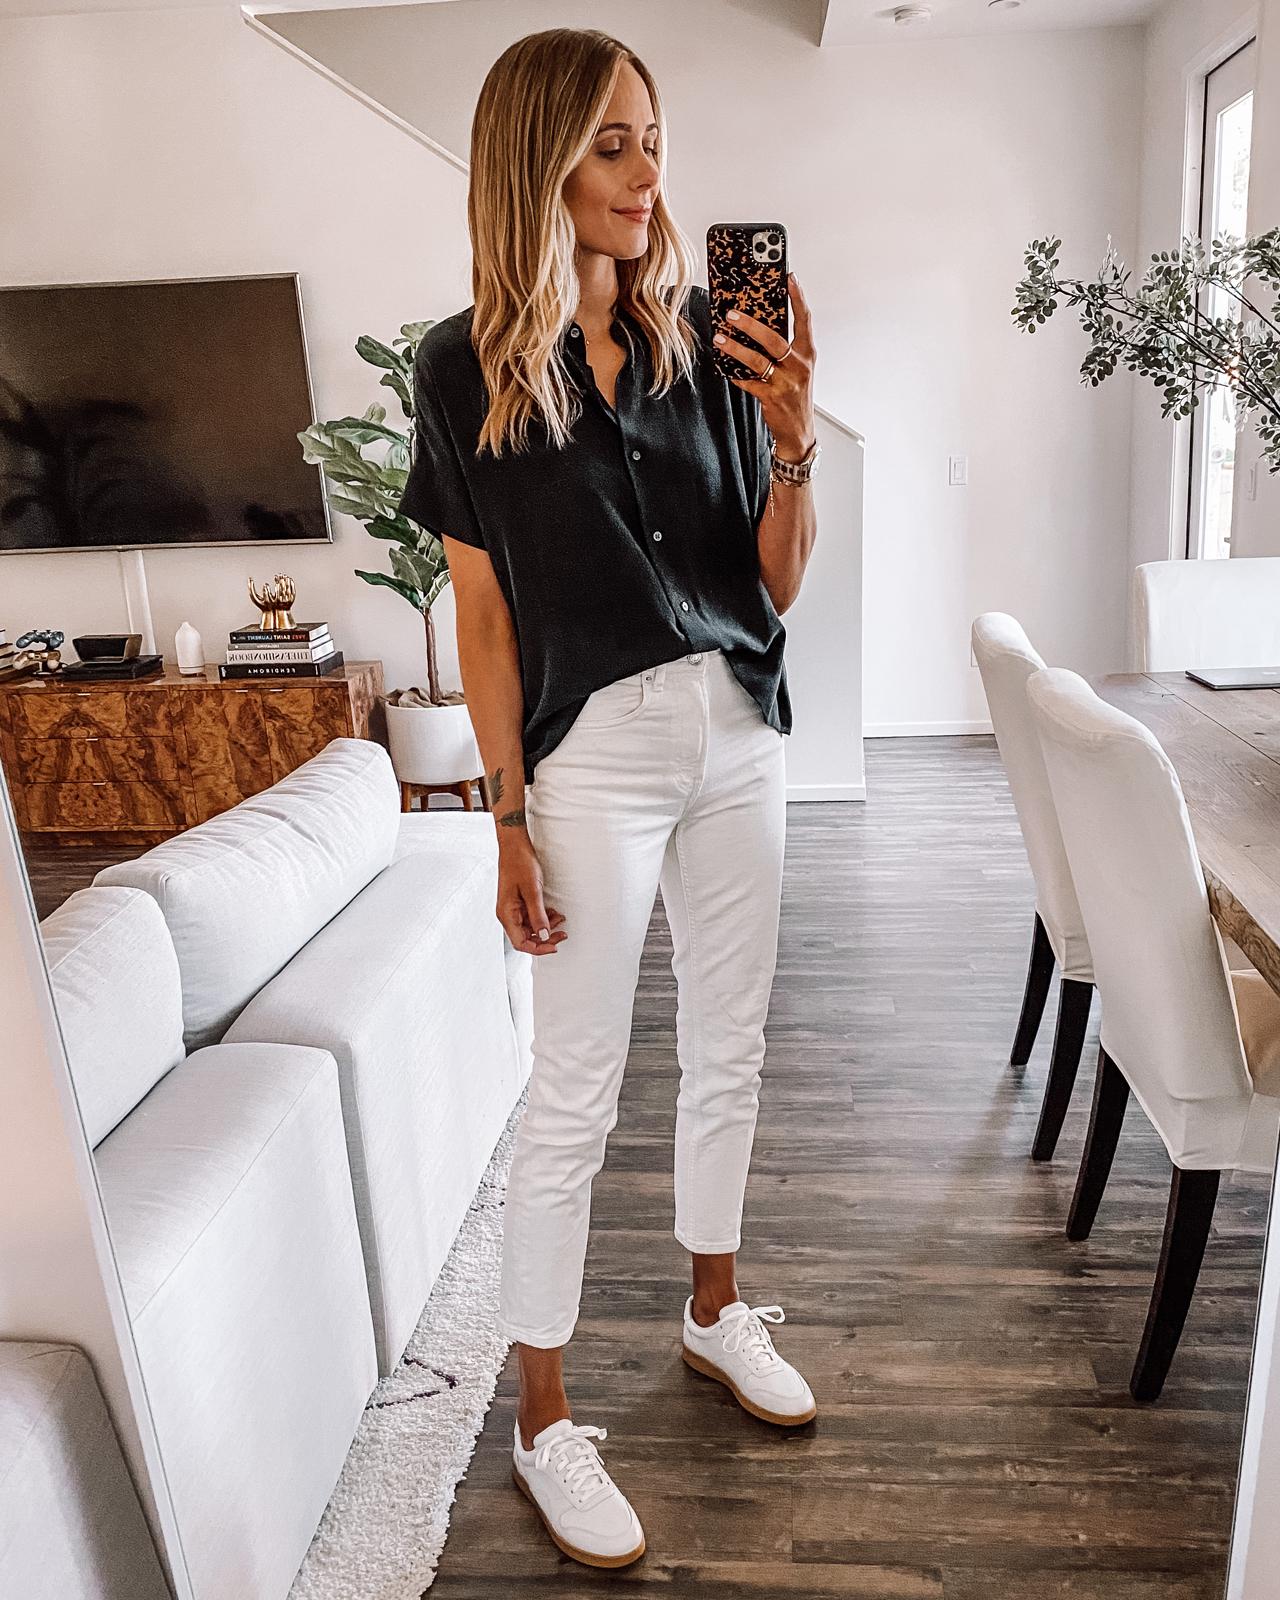 Fashion Jackson Wearing Everlane Black Short Sleeve Button Front Shirt White Jeans Everlane White Sneakers